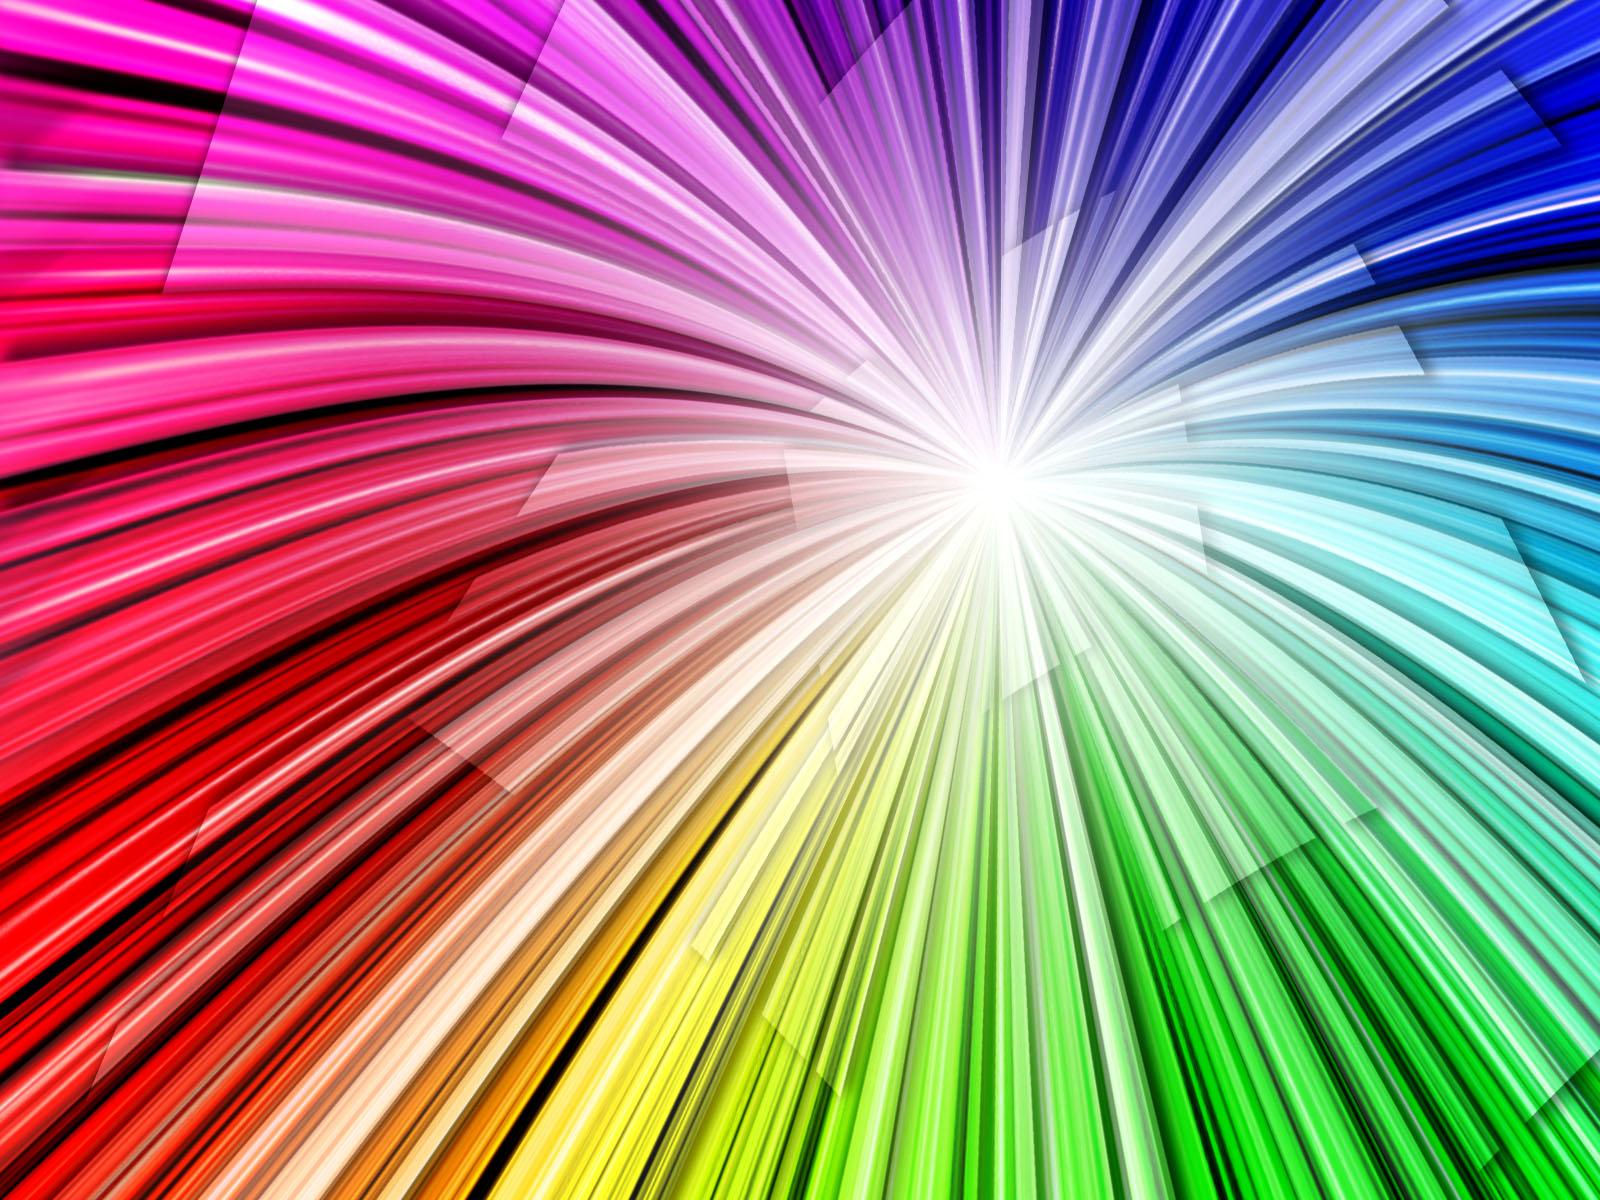 wallpaper see rainbow - photo #15